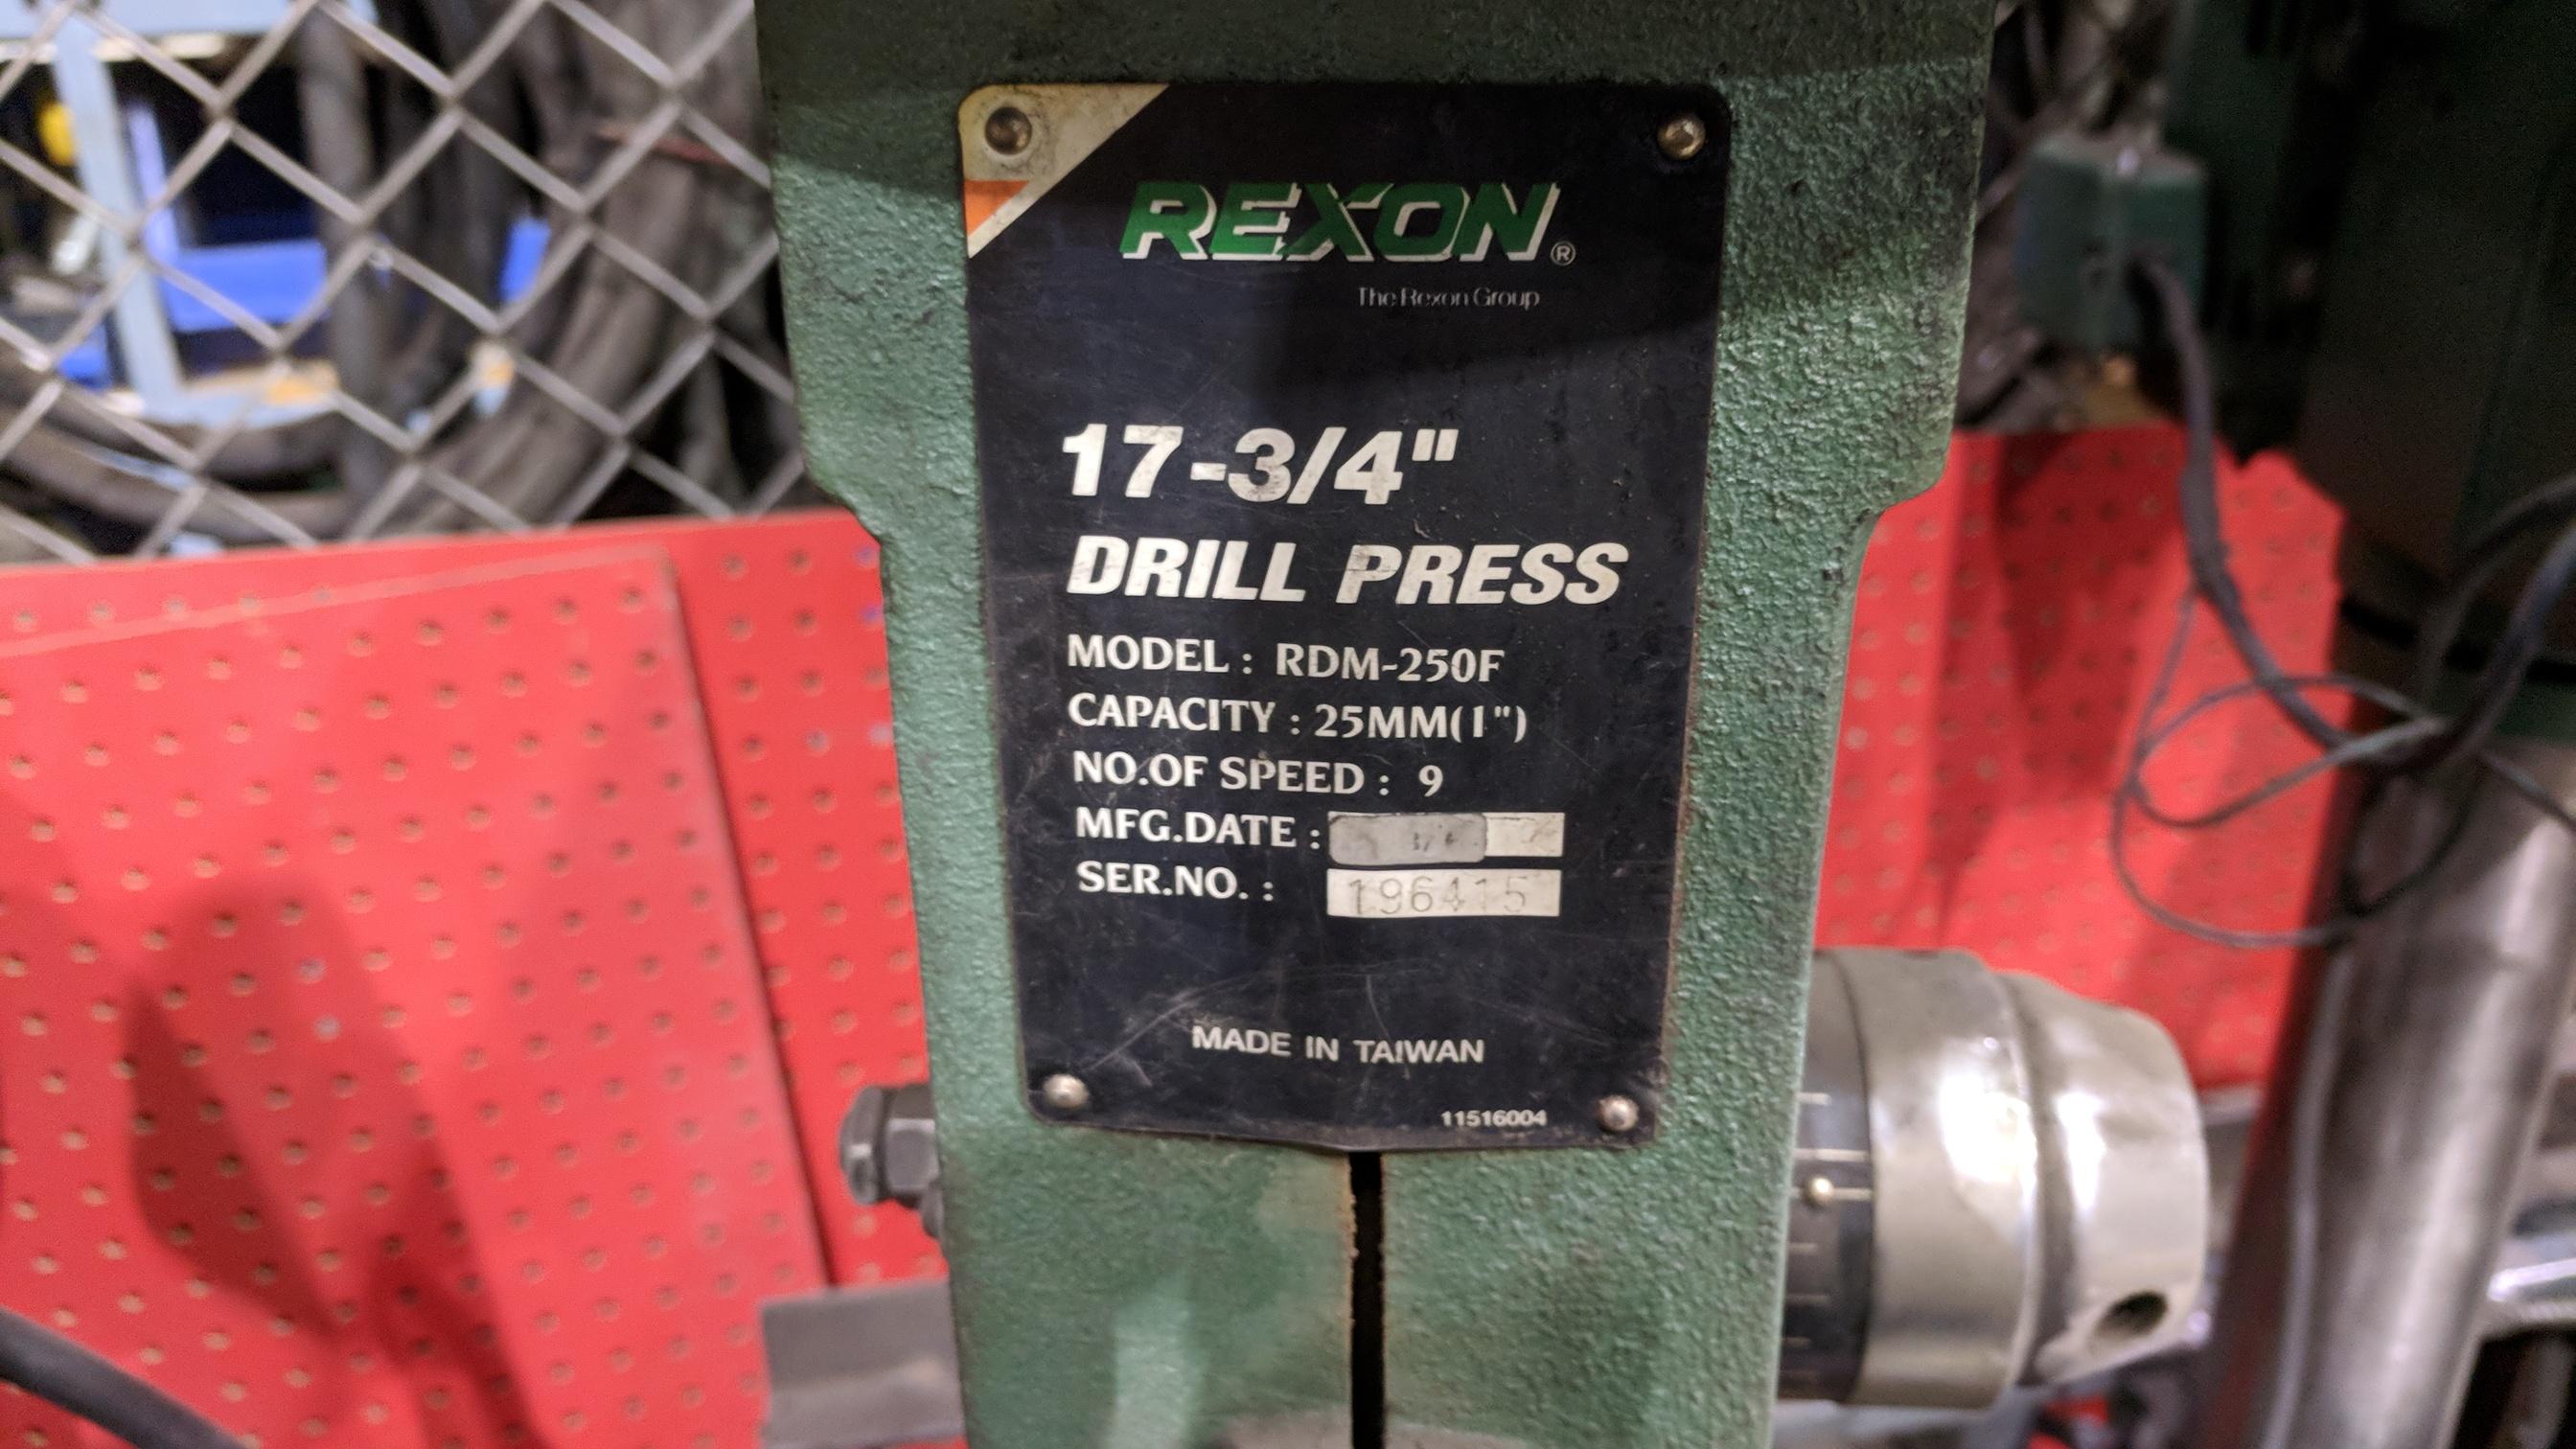 REXON (1998) RDM-250F HEAVY DUTY FLOOR TYPE DRILL PRESS, S/N N/A (NOT IN SERVICE) - Image 2 of 2